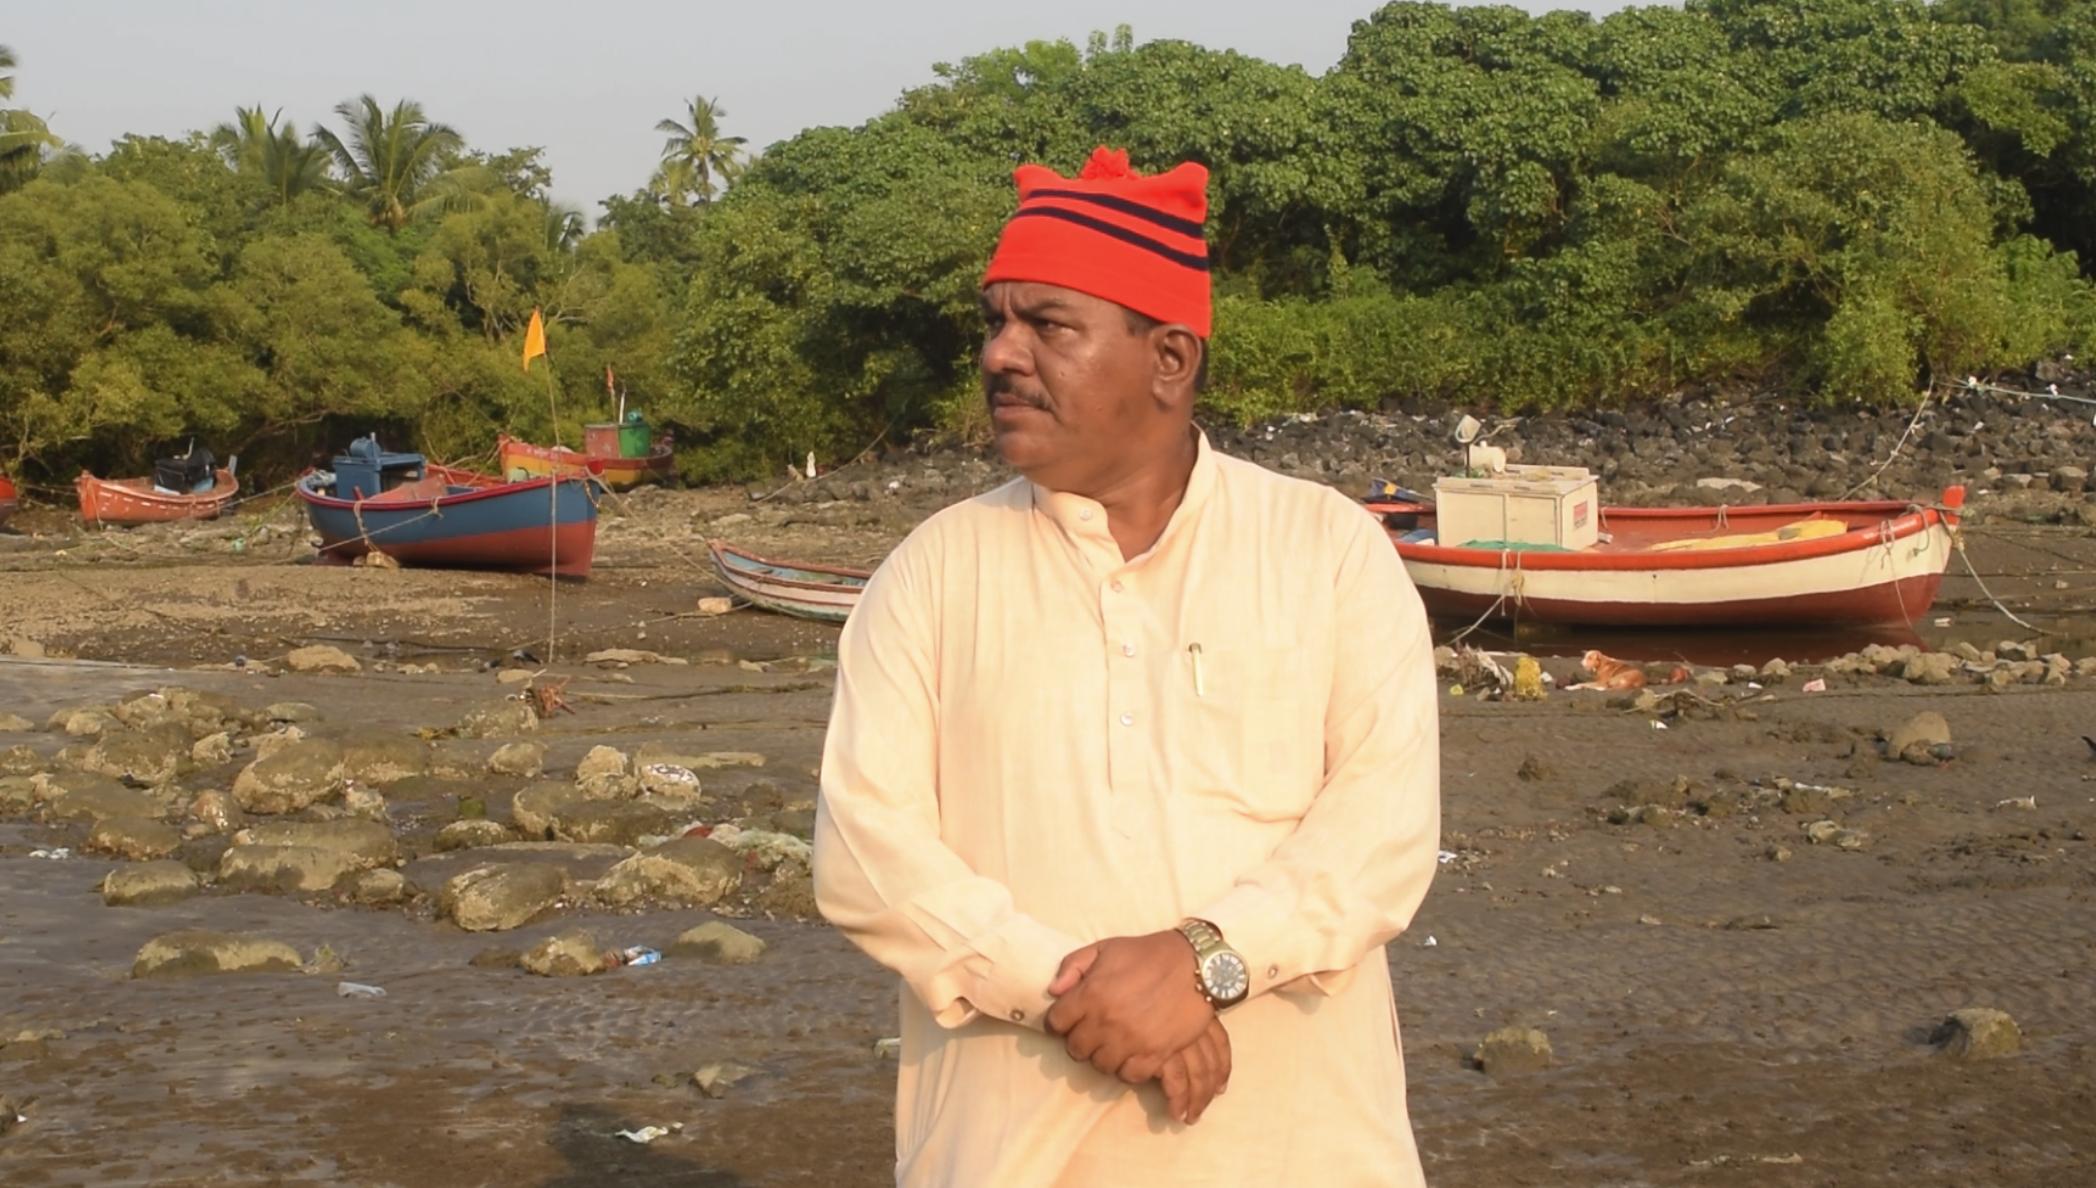 Rajaram Patil, a local resident critical of destruction of mangroves. Photo Shiva Thorat